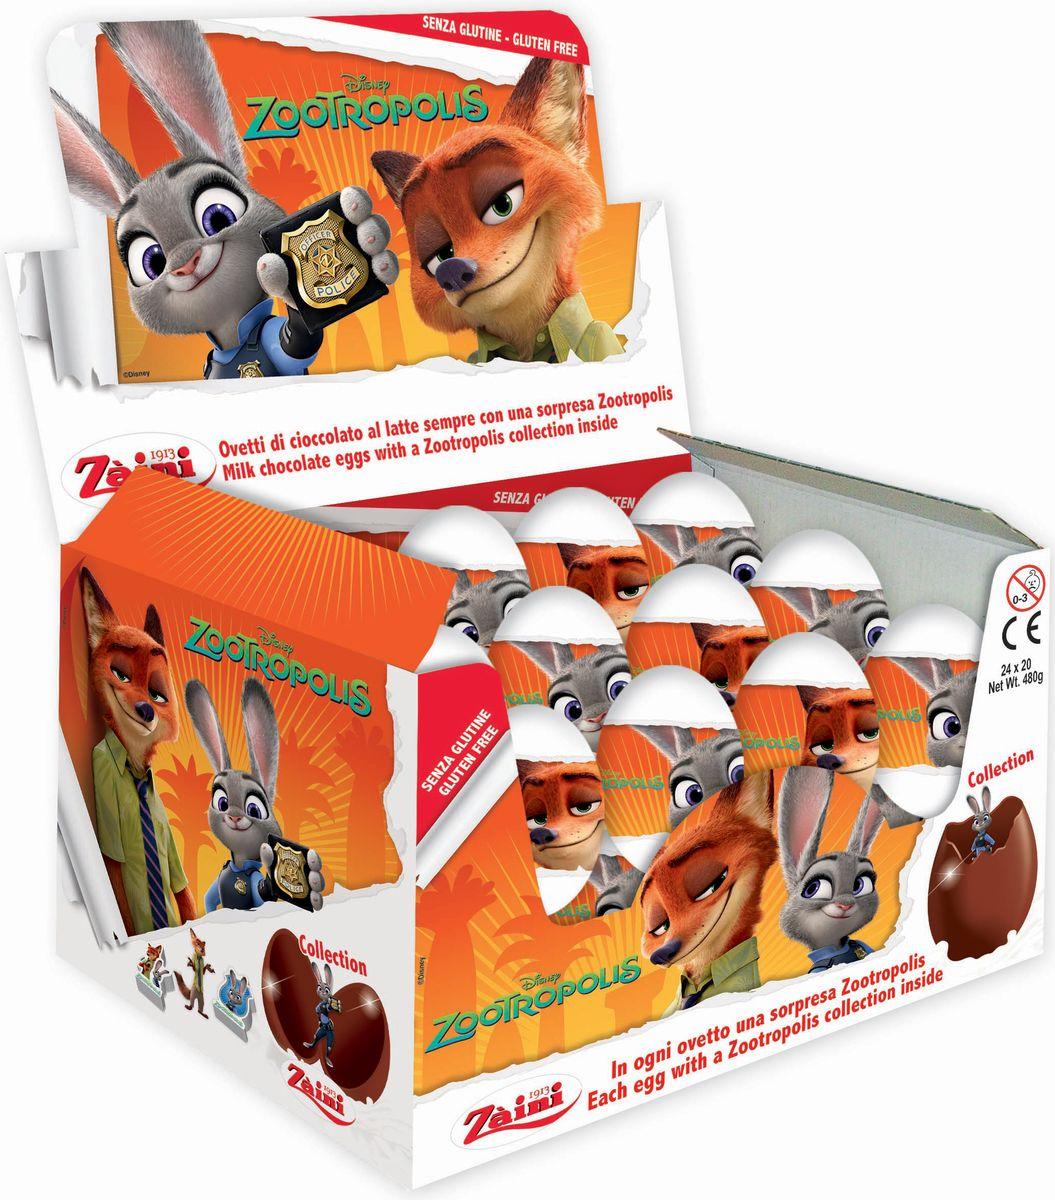 Zaini Zootropolis шоколадные яйца с игрушкой, 24 шт по 20 г zaini choco